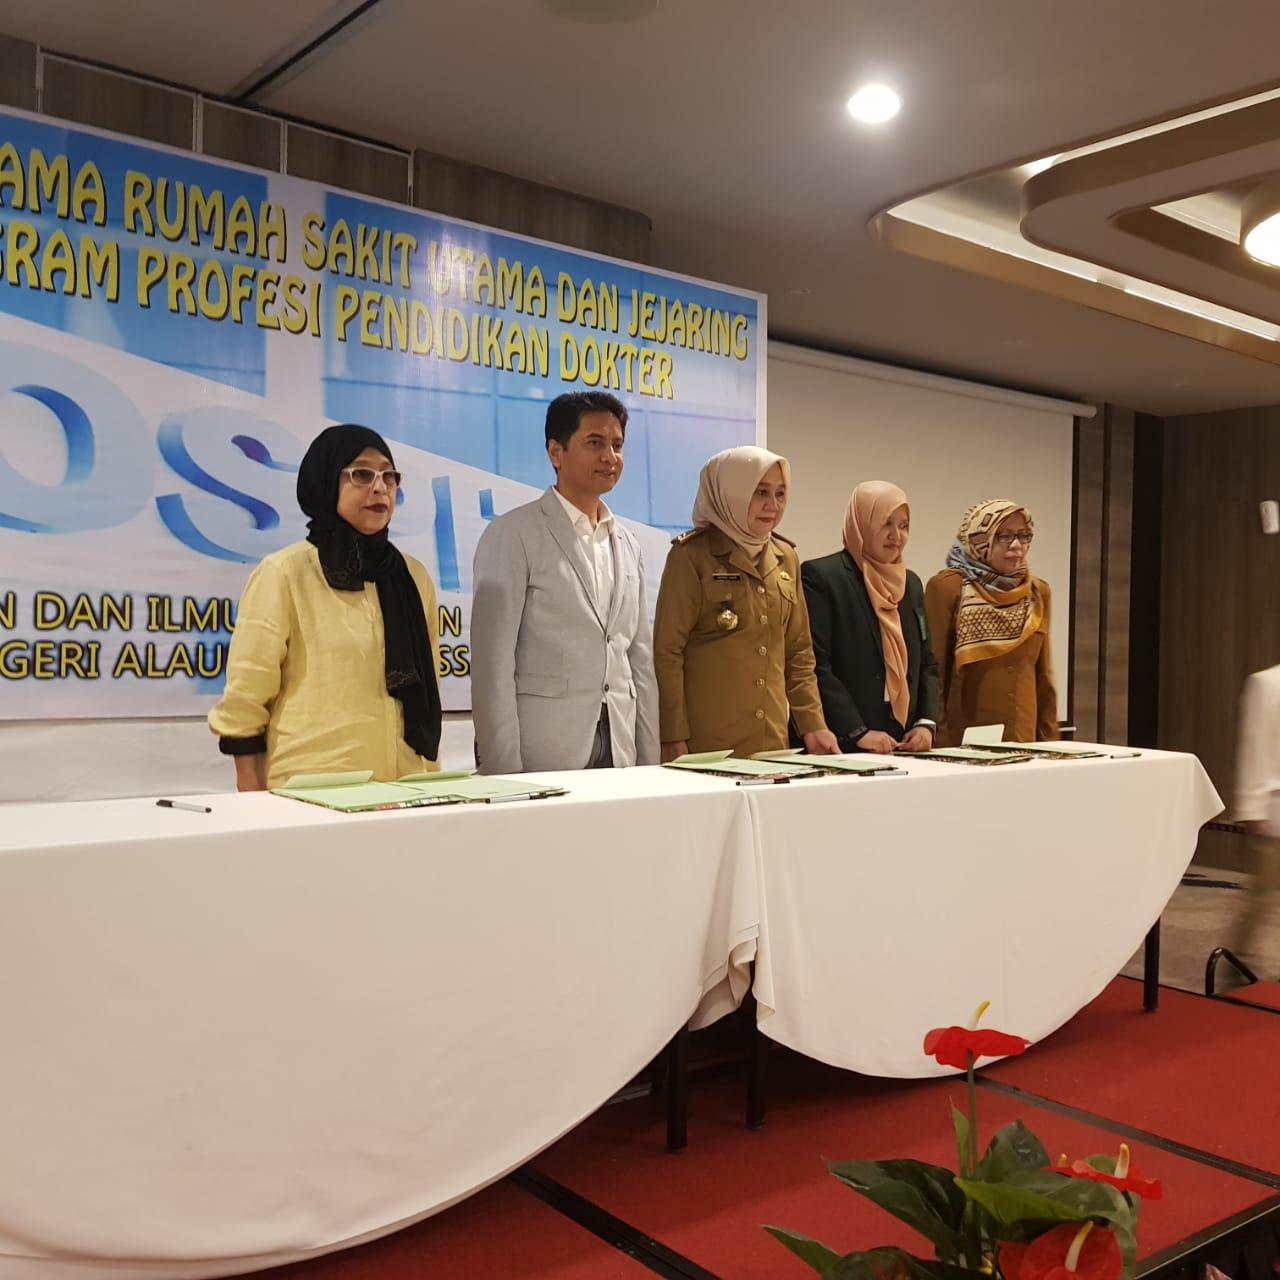 Gambar FKIK UIN Alauddin Gelar Workshop Kerja Sama Rumah Sakit Hingga Luncurkan Program Asyifa